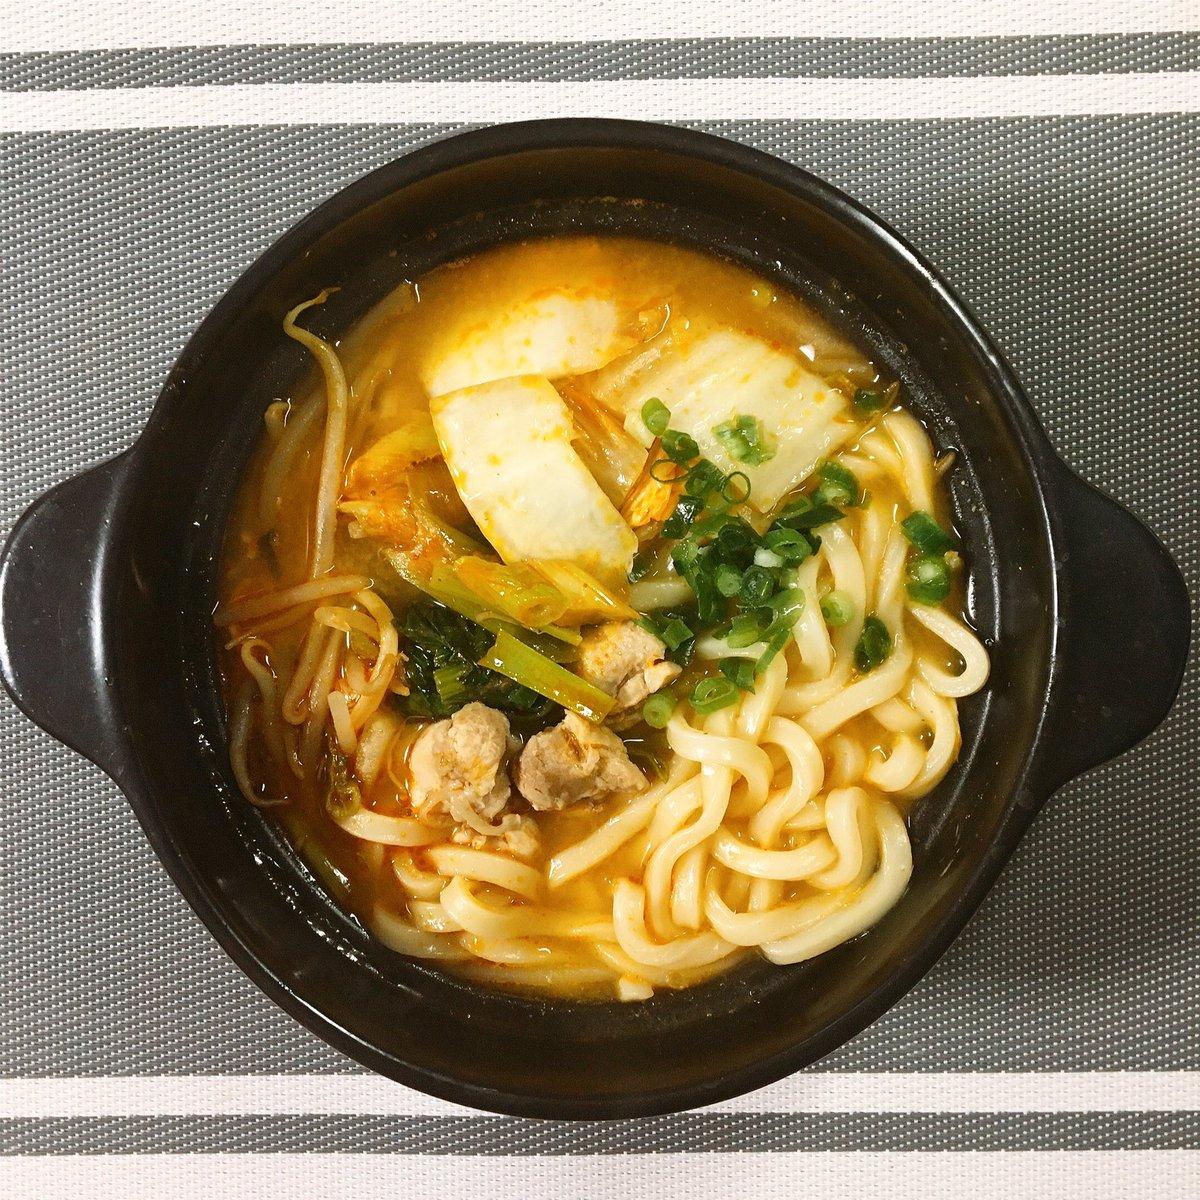 Today's Tom Yum Nabeyakiudon🍲 トムヤム鍋焼きうどん🙂  #breakfast #nabeyakiudon #noodles #japanesefood #healthyfood #鍋焼きうどん #うどん #tomyumnoodle #tomyum https://t.co/S5tjagnBad